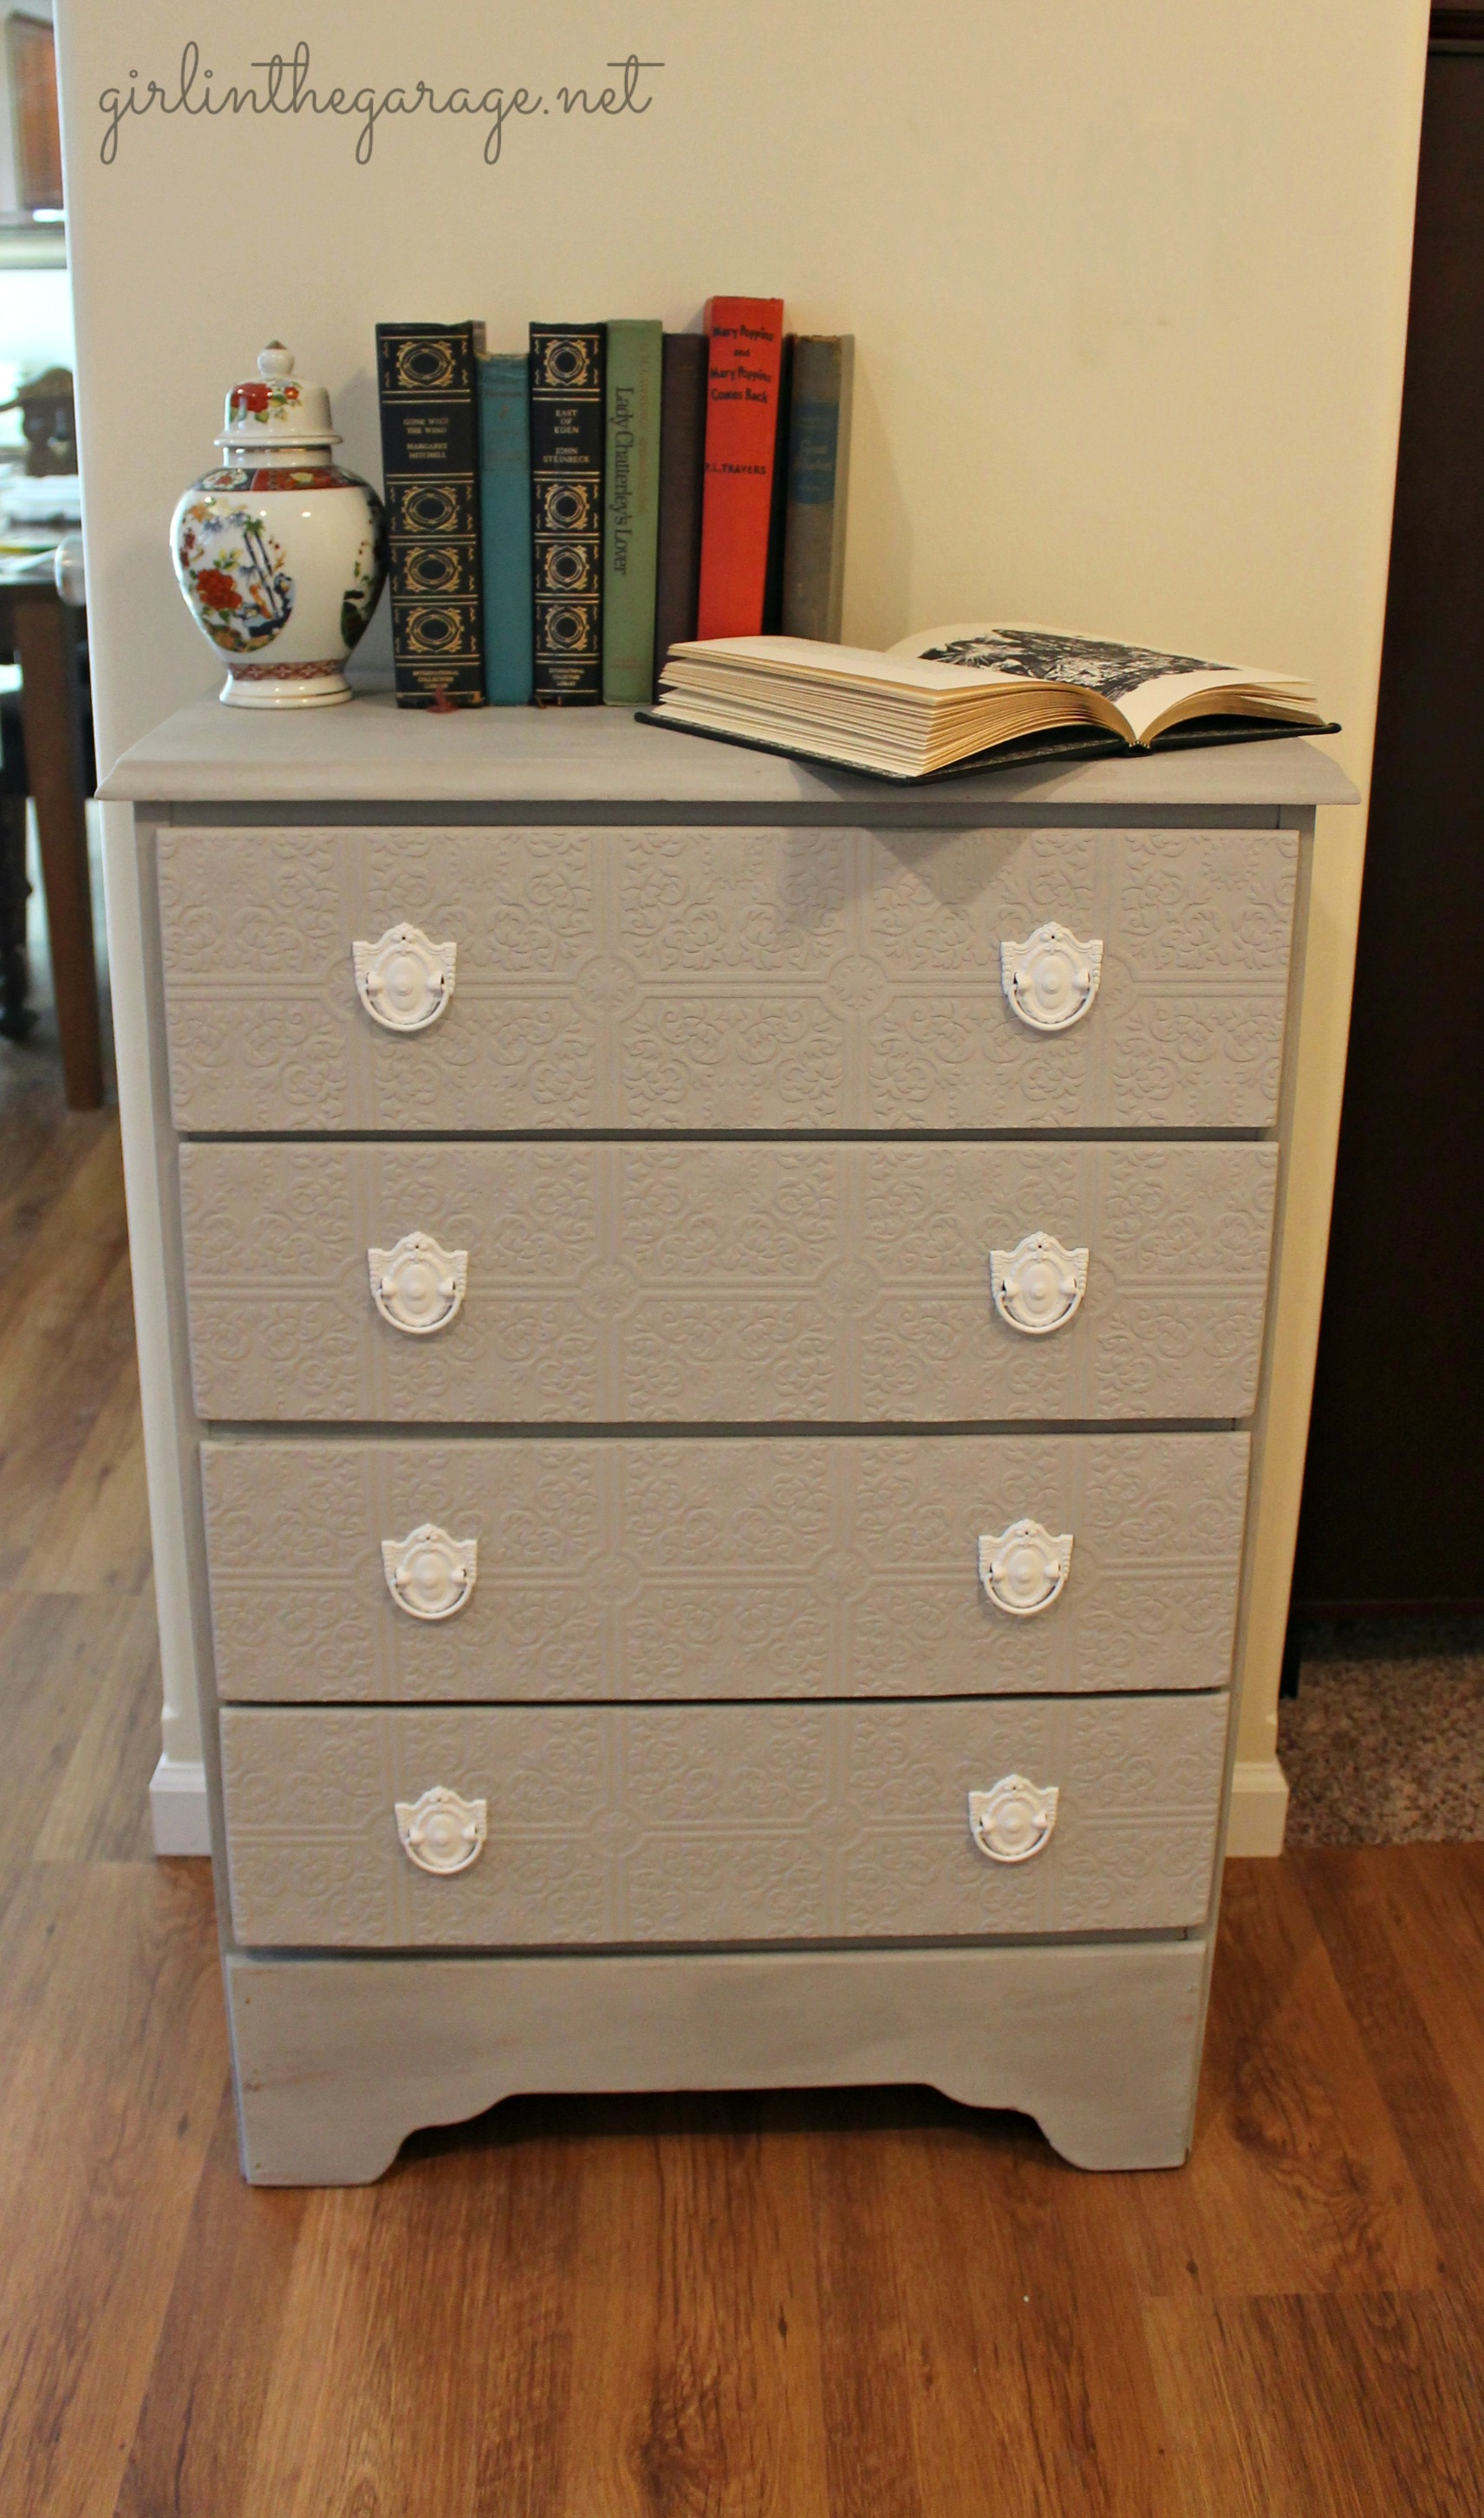 textured paintable wallpaper dresser - photo #3